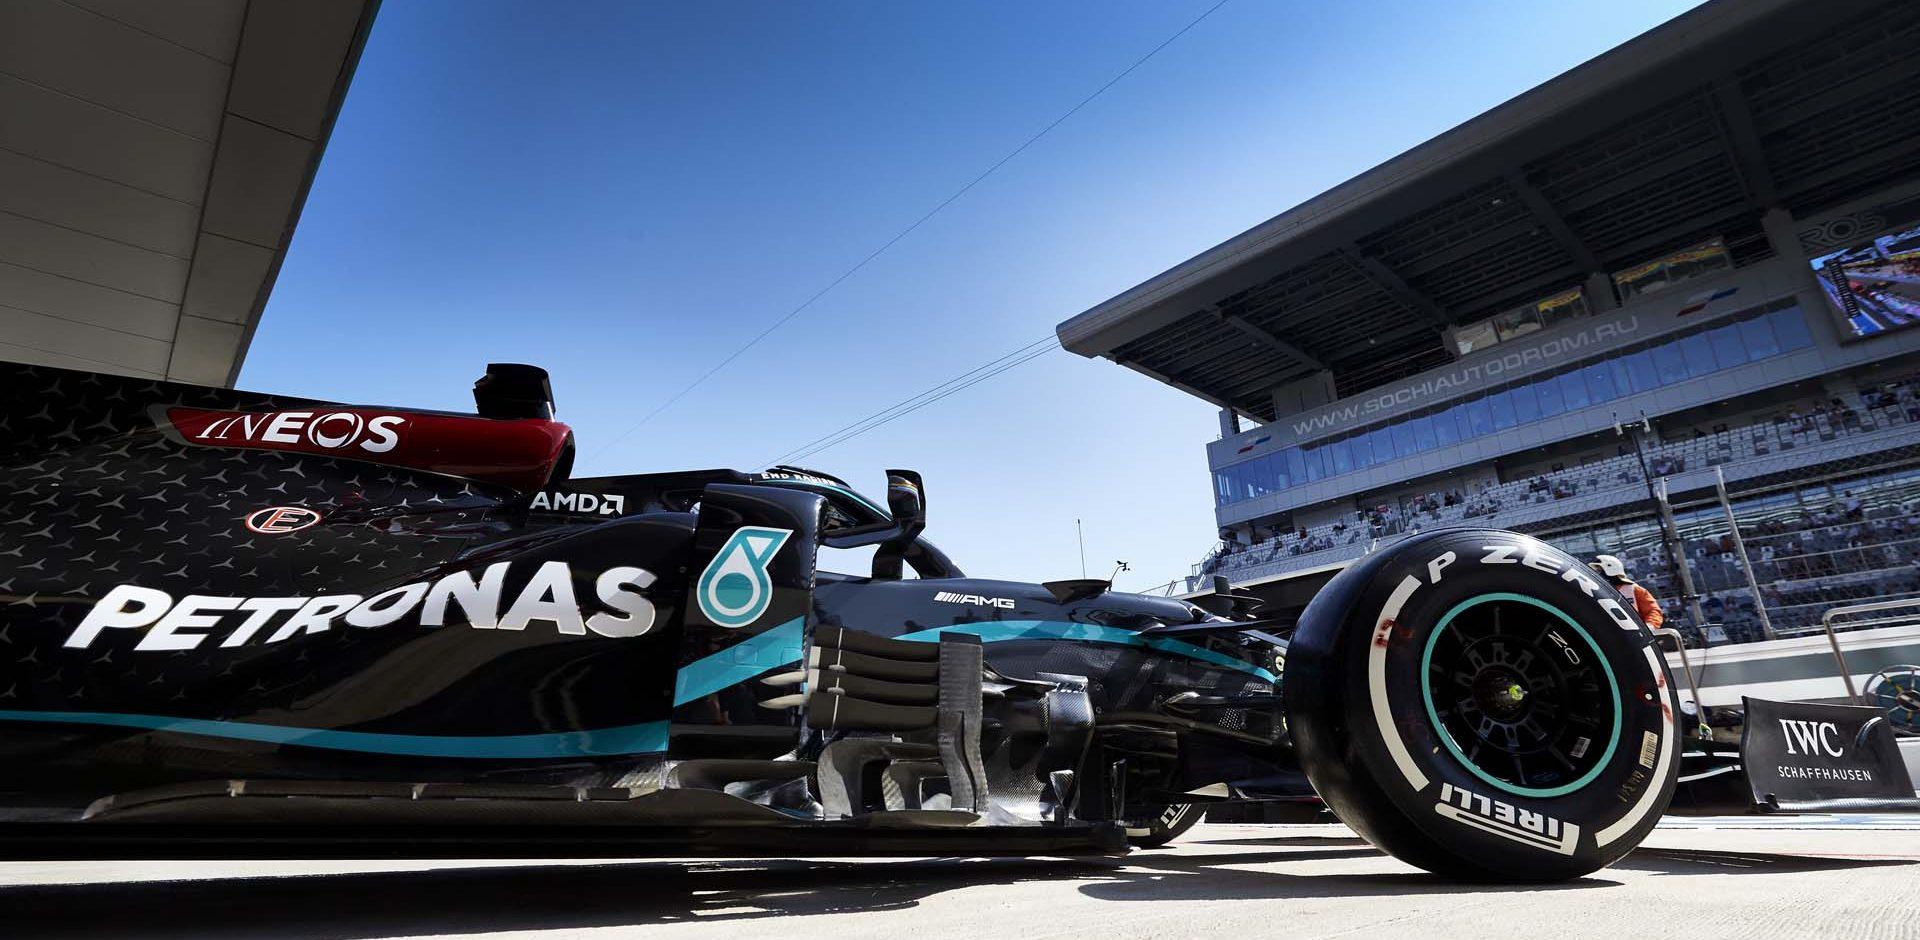 2020 Russian Grand Prix, Friday - Steve Etherington Lewis Hamilton Mercedes